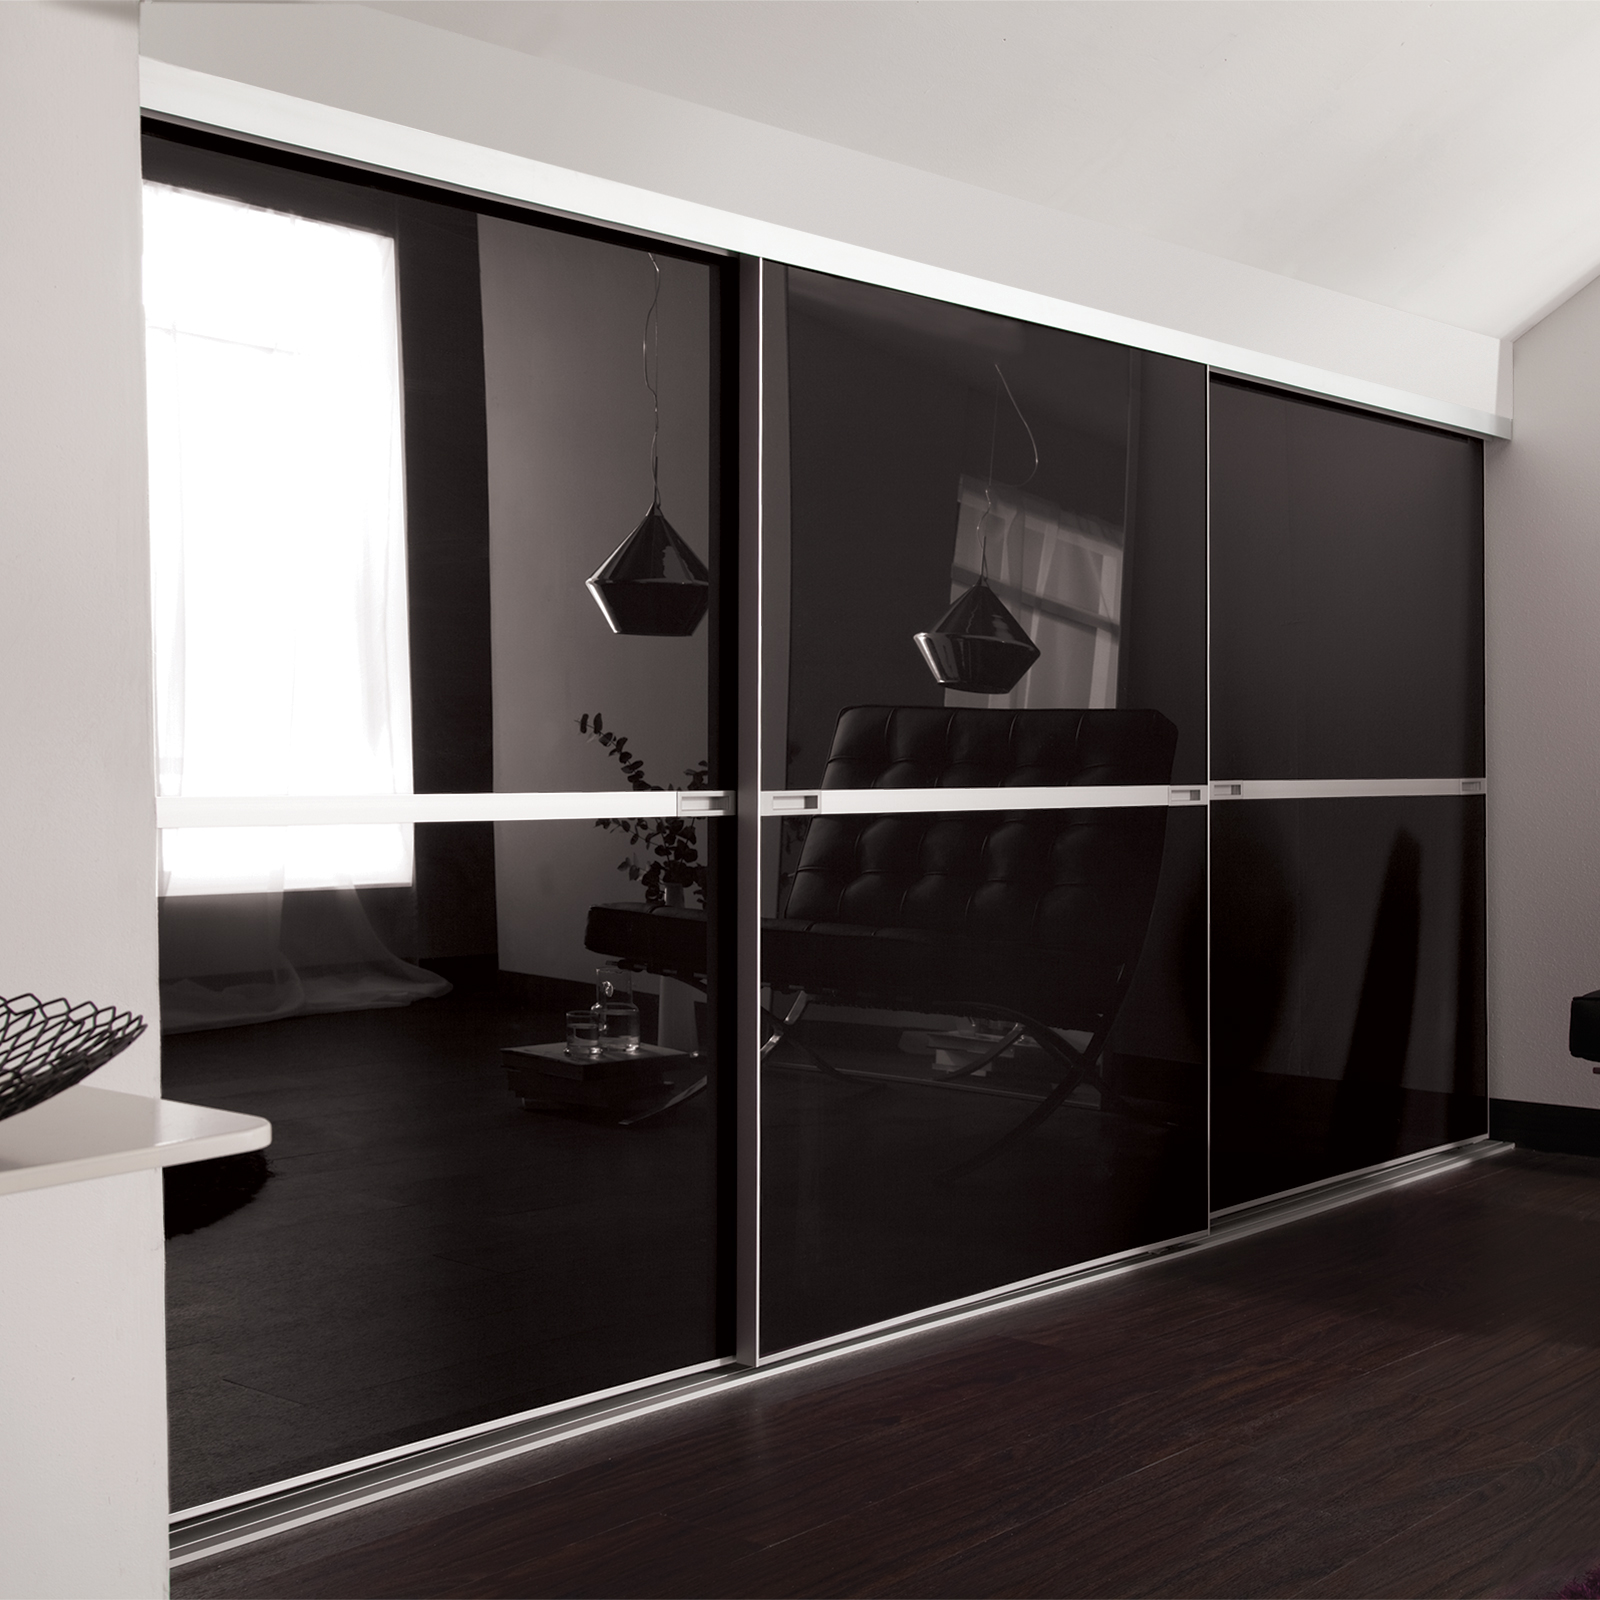 Loft doors  finished installation using angled ceiling blocks